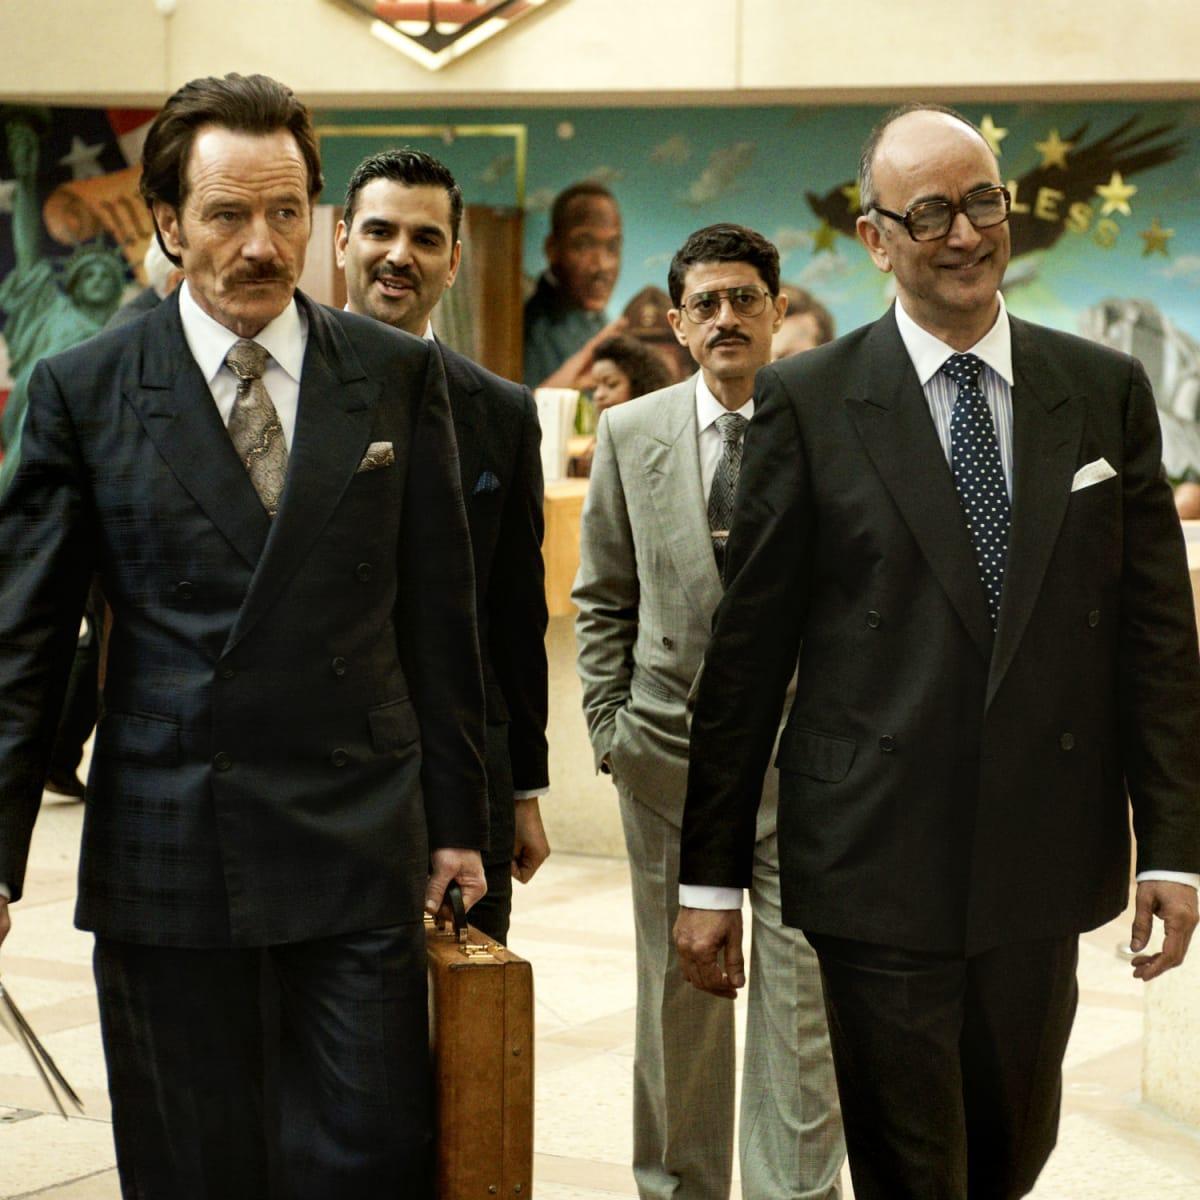 Bryan Cranston, Saïd Taghmaoui, and Art Malik in The Infiltrator